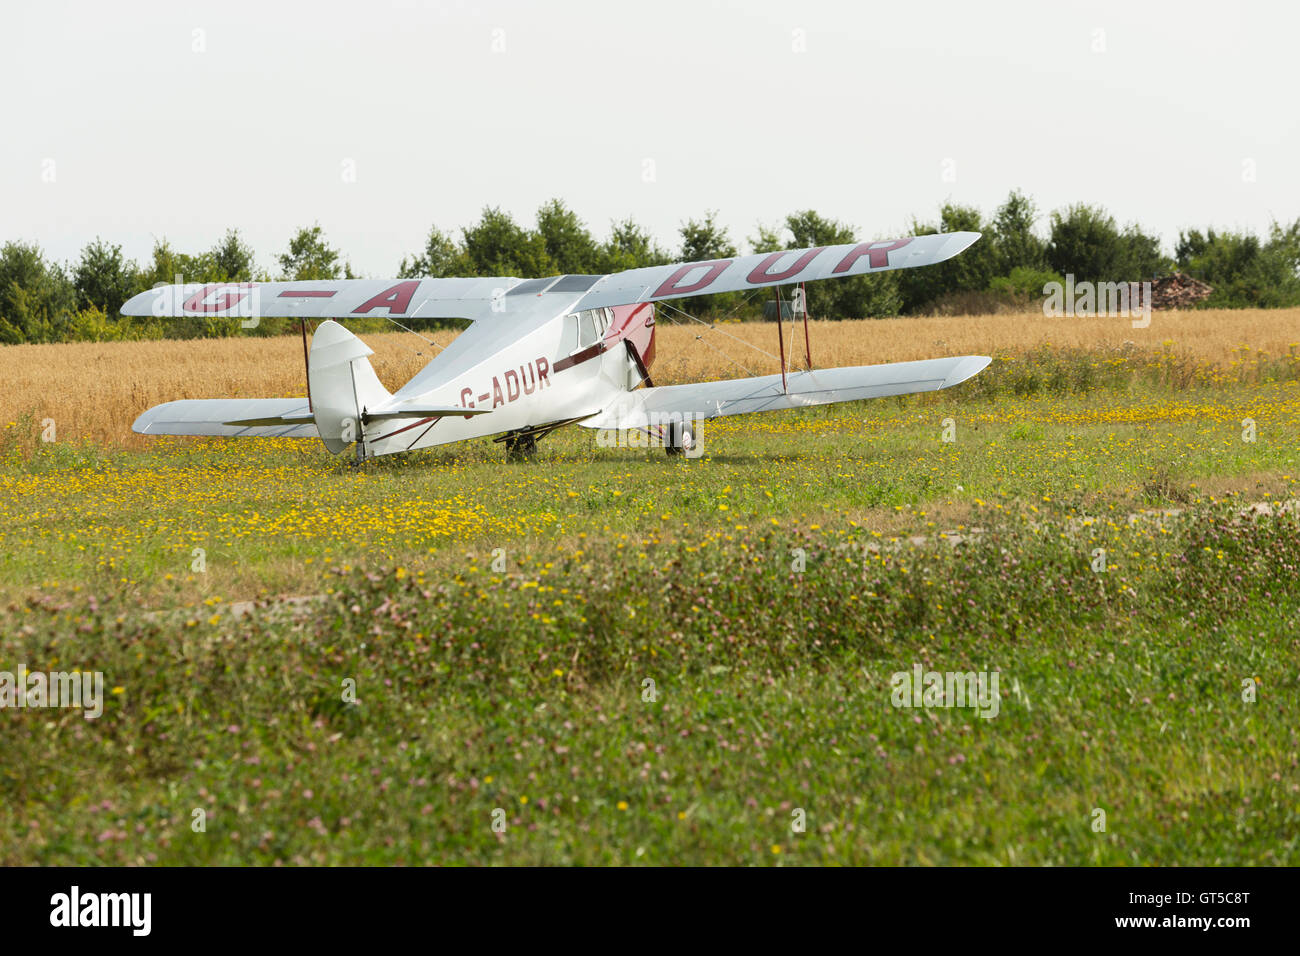 De Havilland Hornet Moth bi plane G-ADUR landing on grass airstrip airfield. Unsharpened Stock Photo